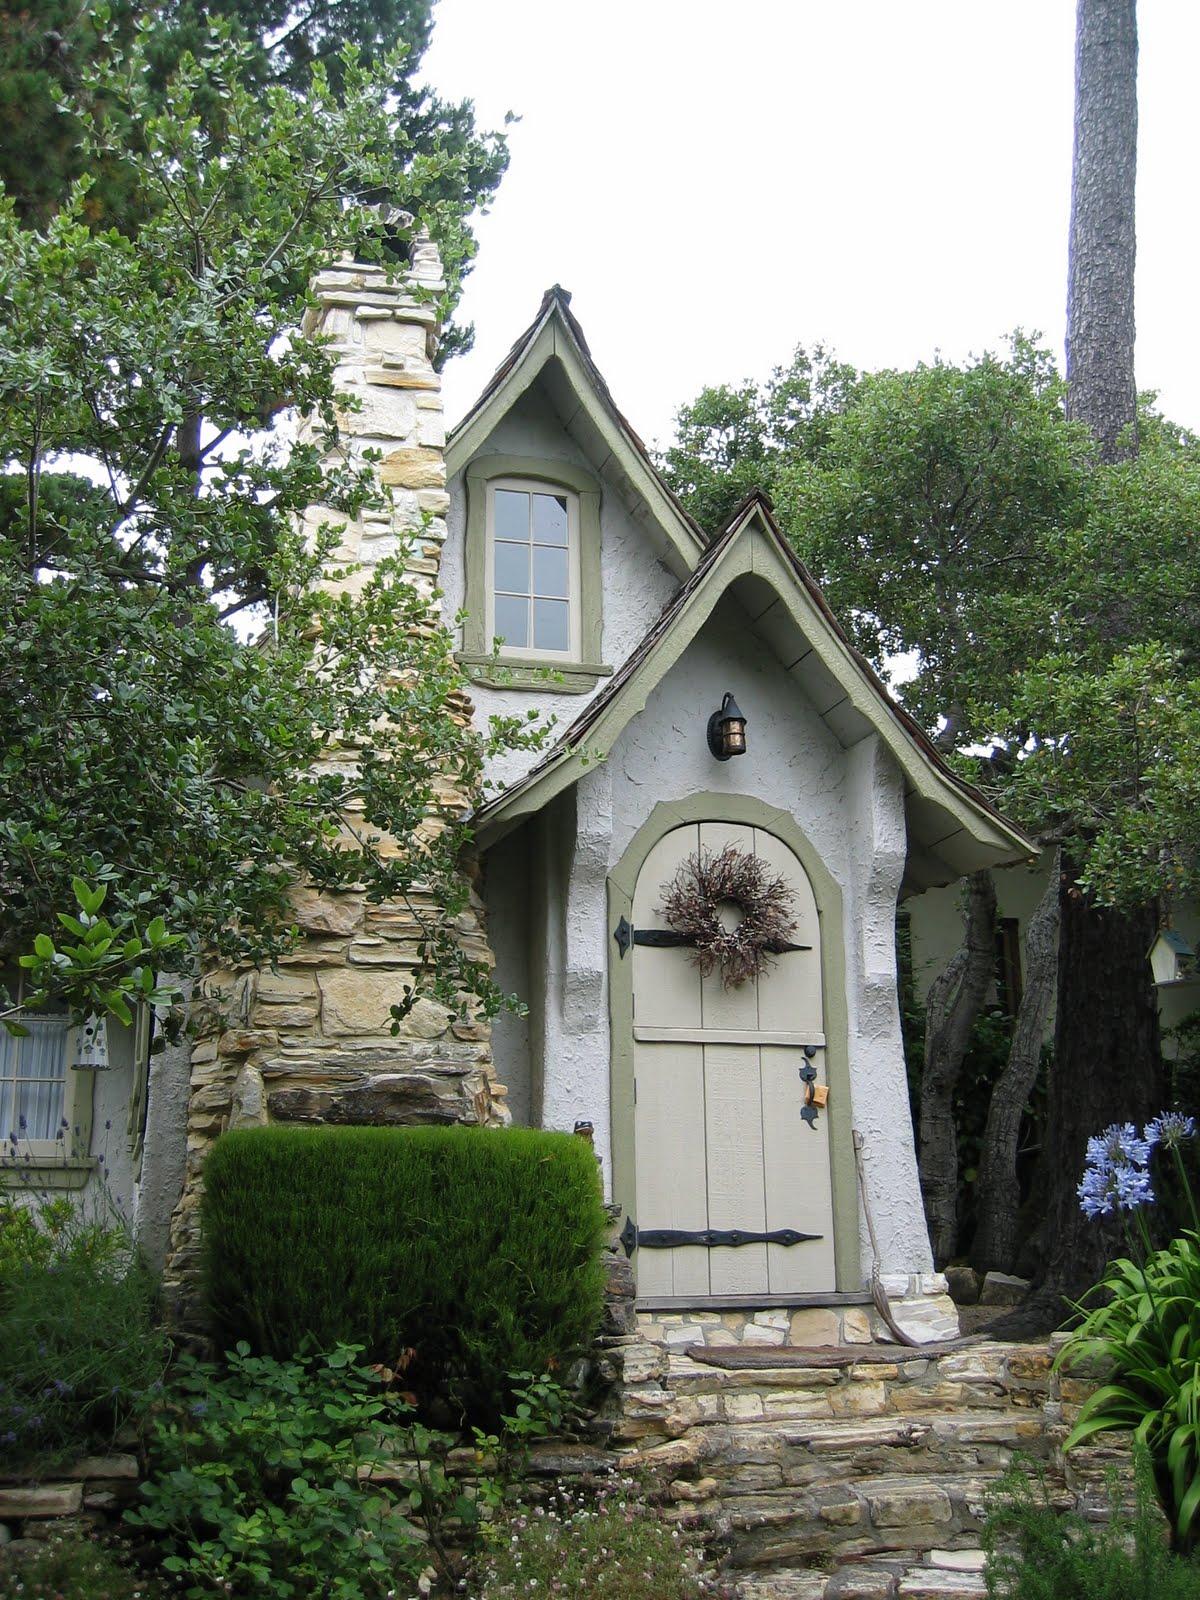 A new quaint cottage at Jigsaw